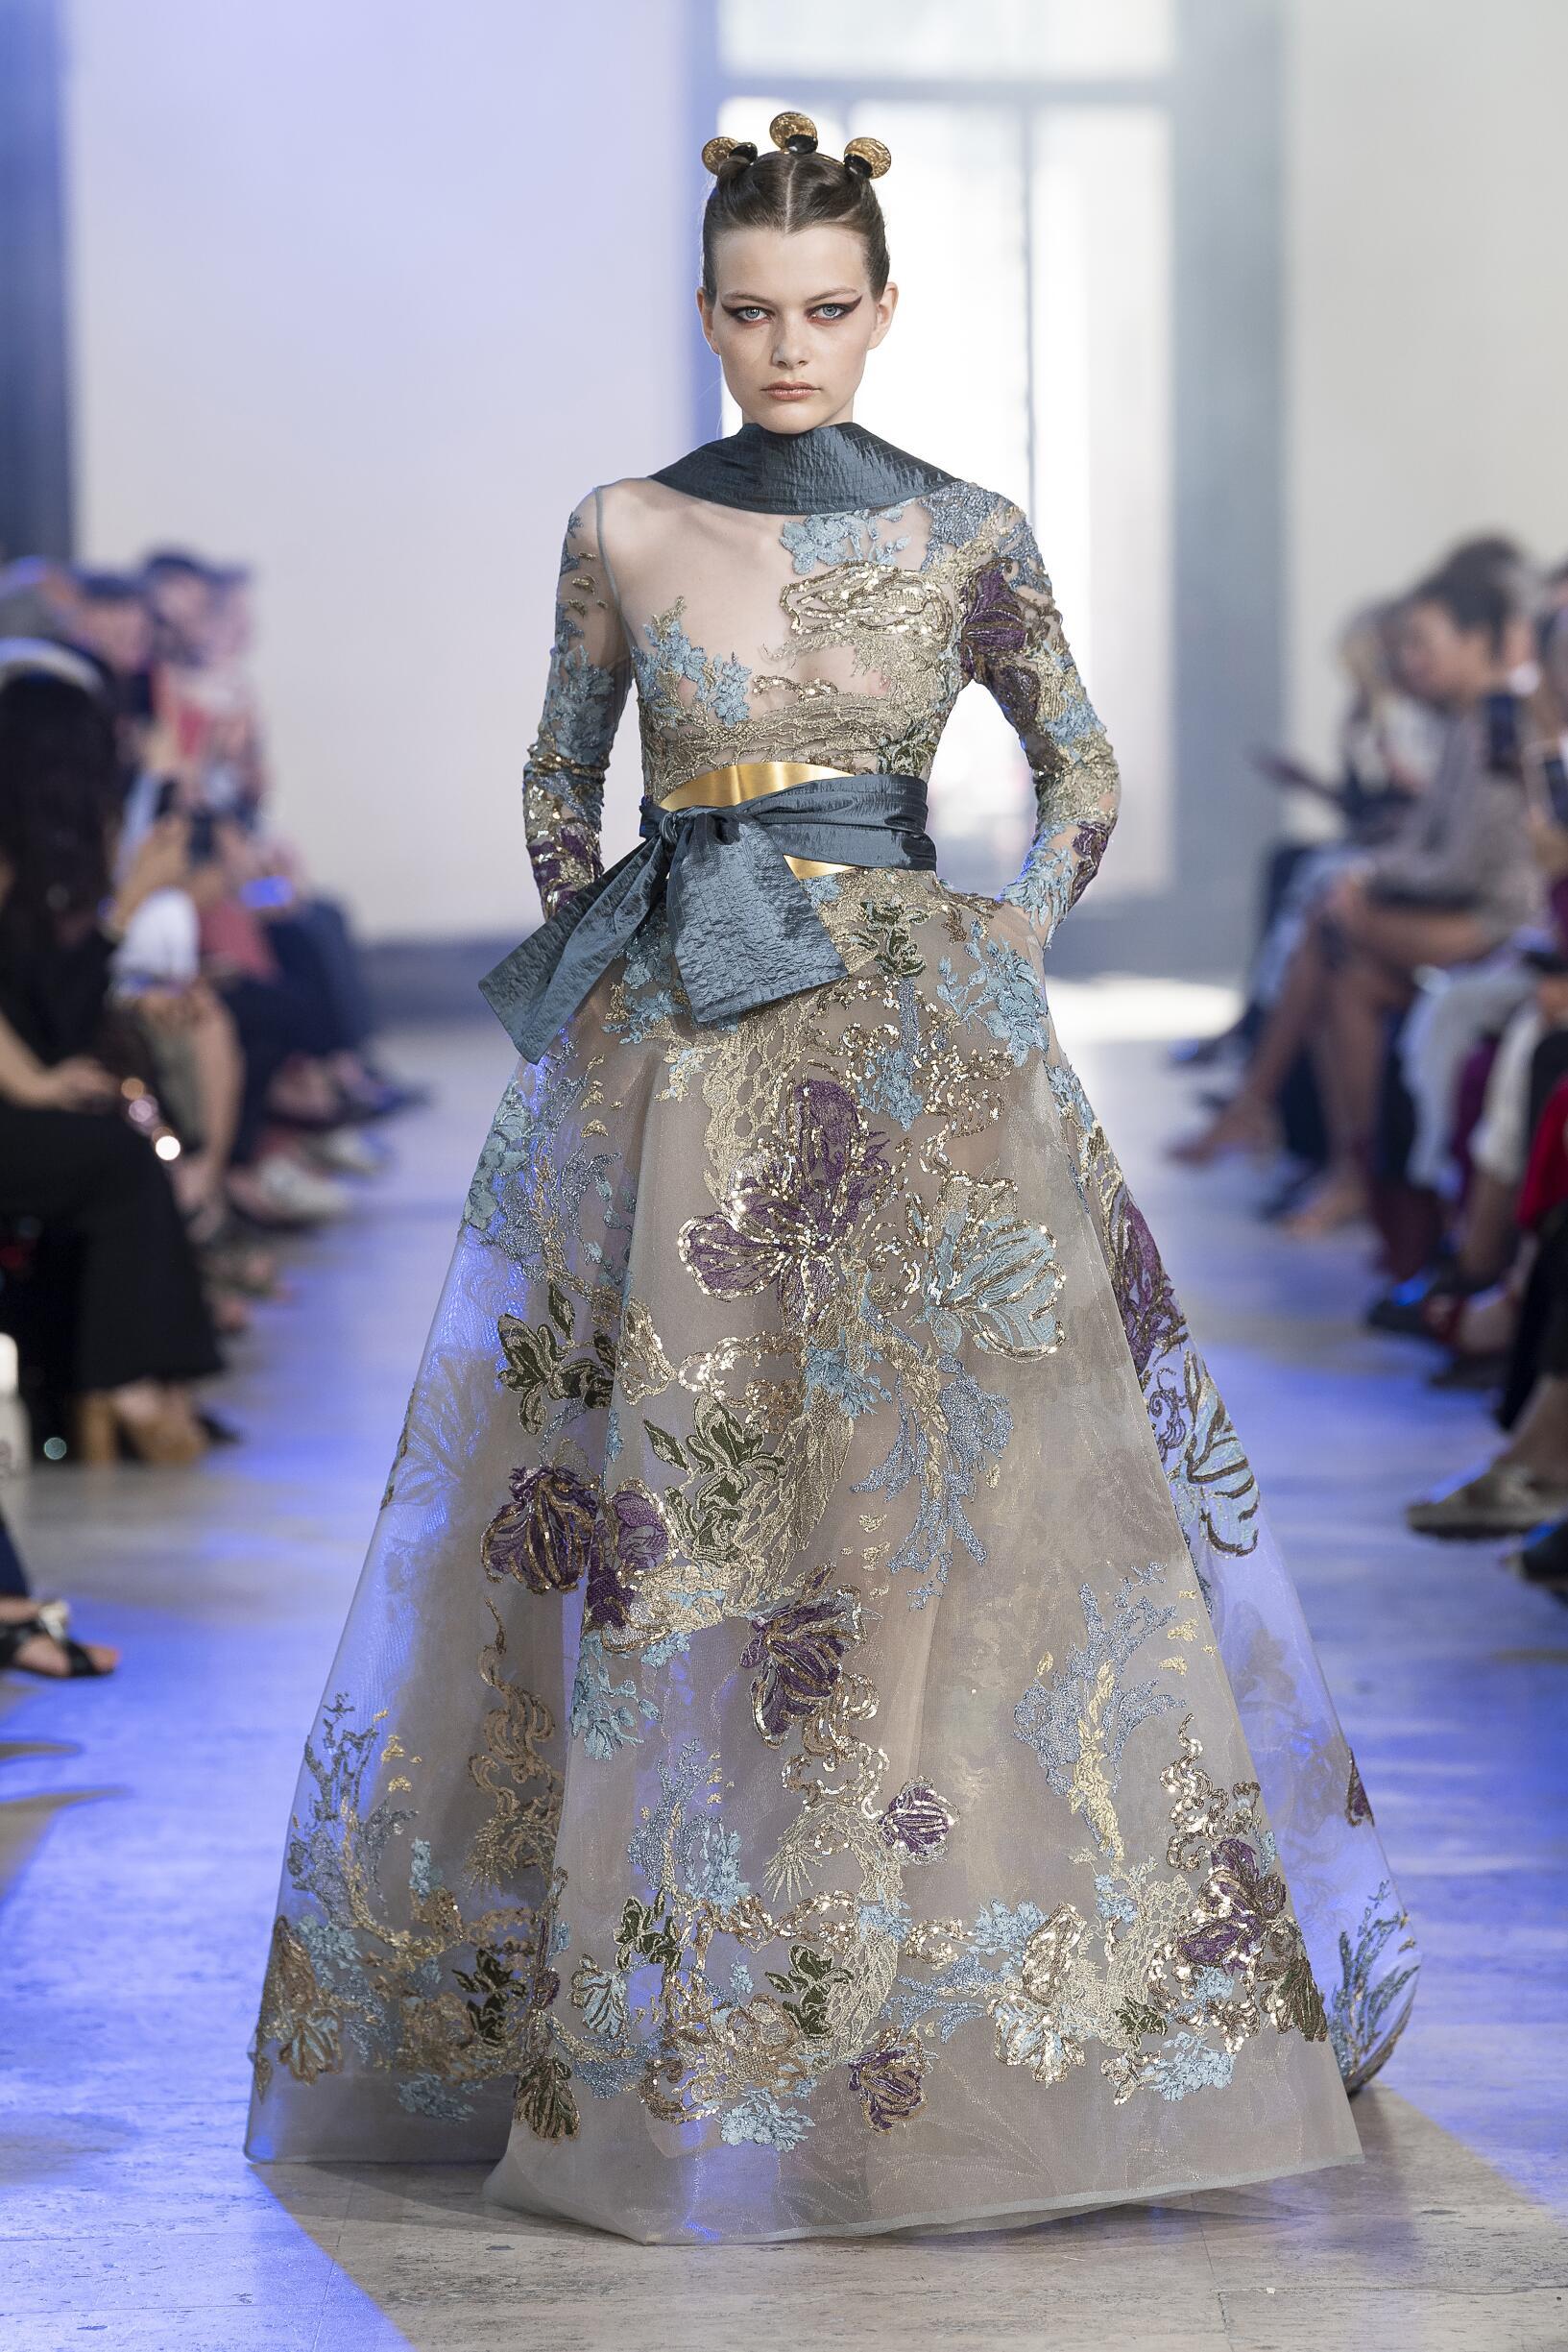 Catwalk Elie Saab Haute Couture Woman Fashion Show Winter 2019-2020